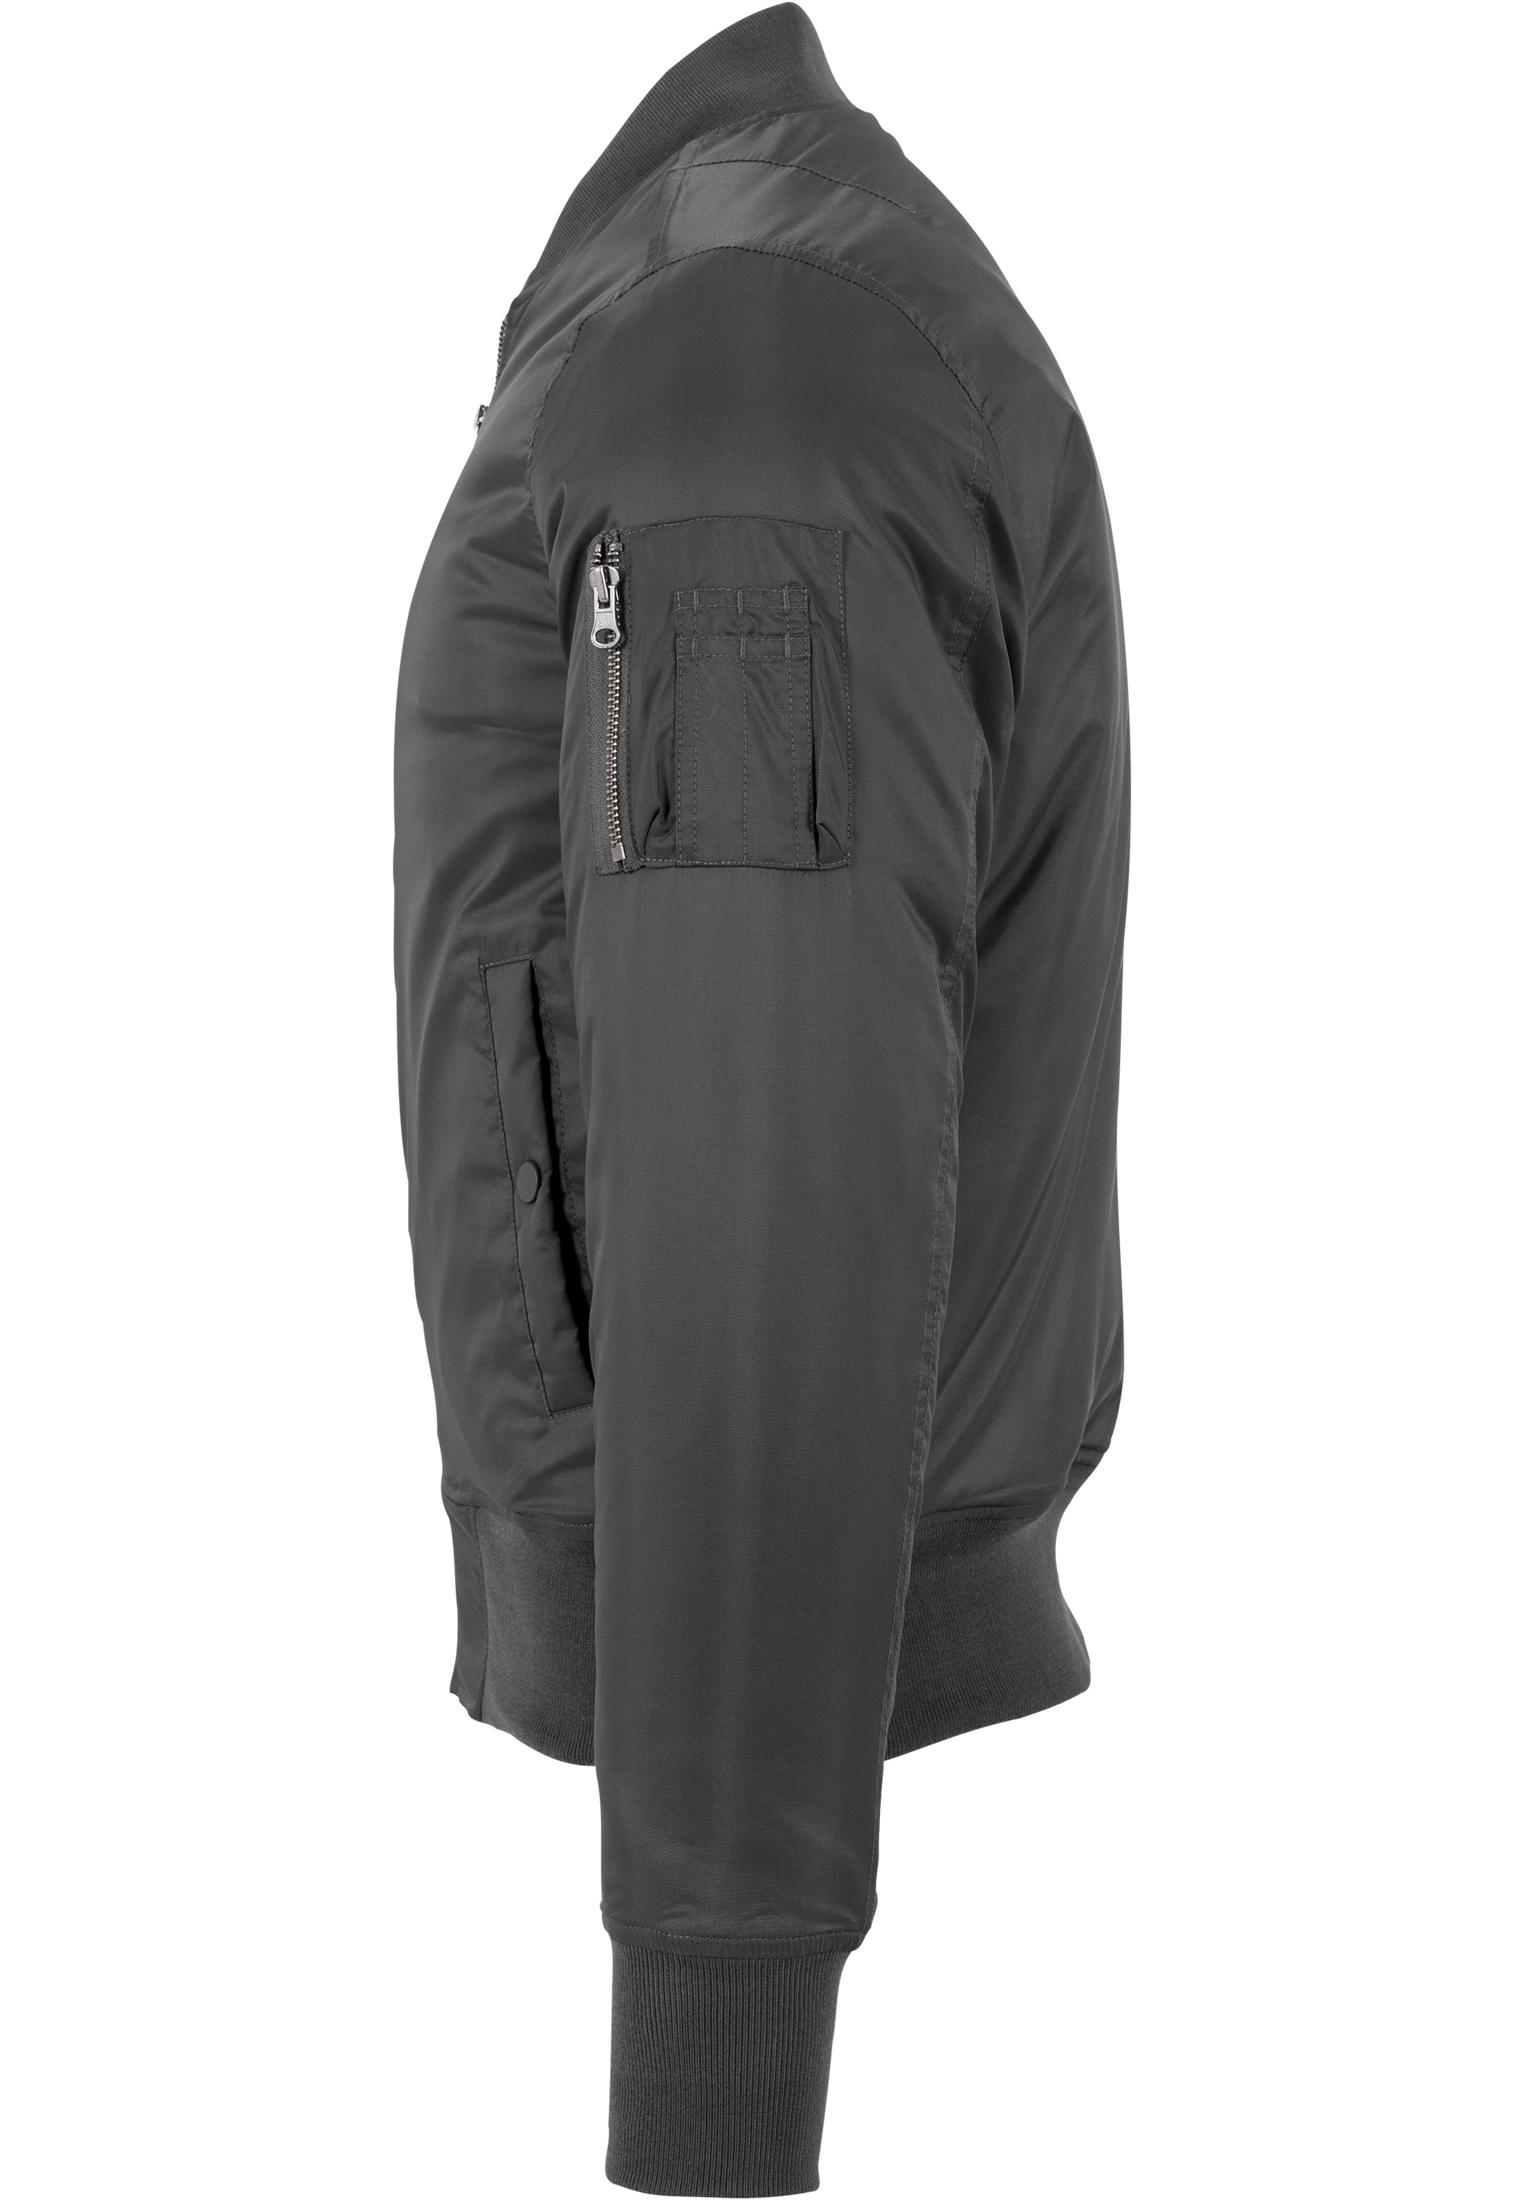 Urban Classics Herren Leichte Jacke Übergangsjacke Basic Bomber Jacket